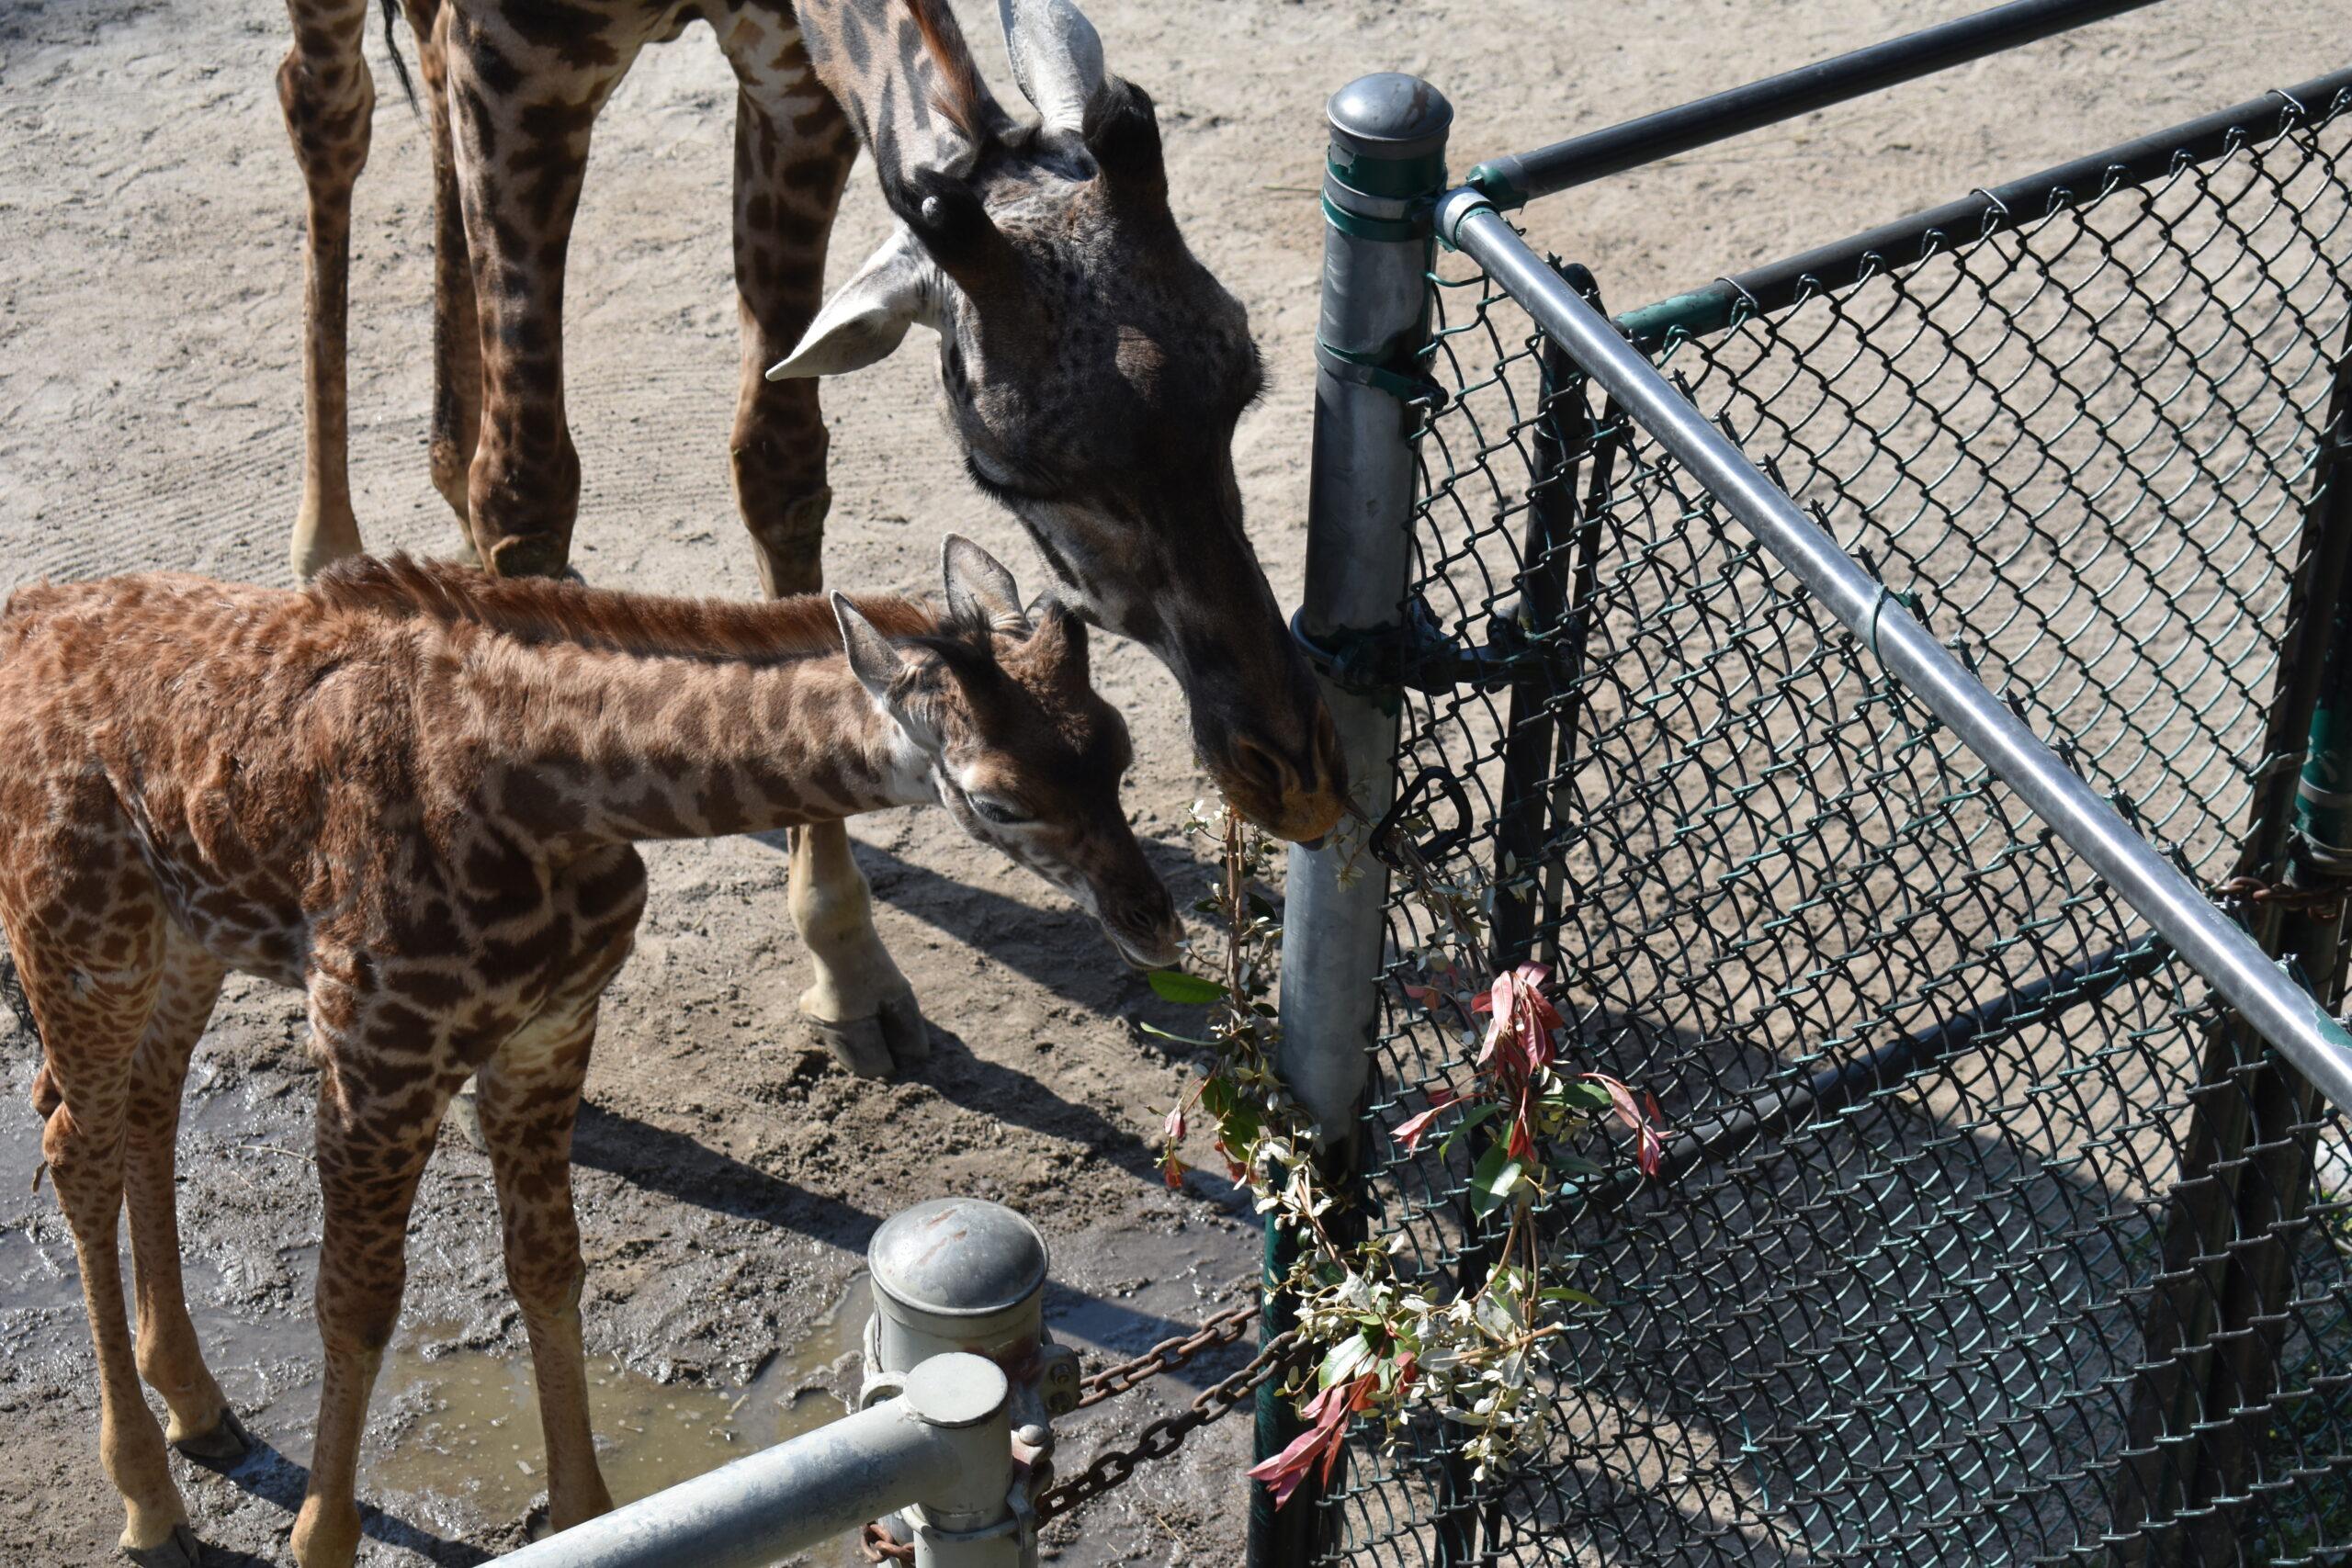 giraffes eating from a wreath